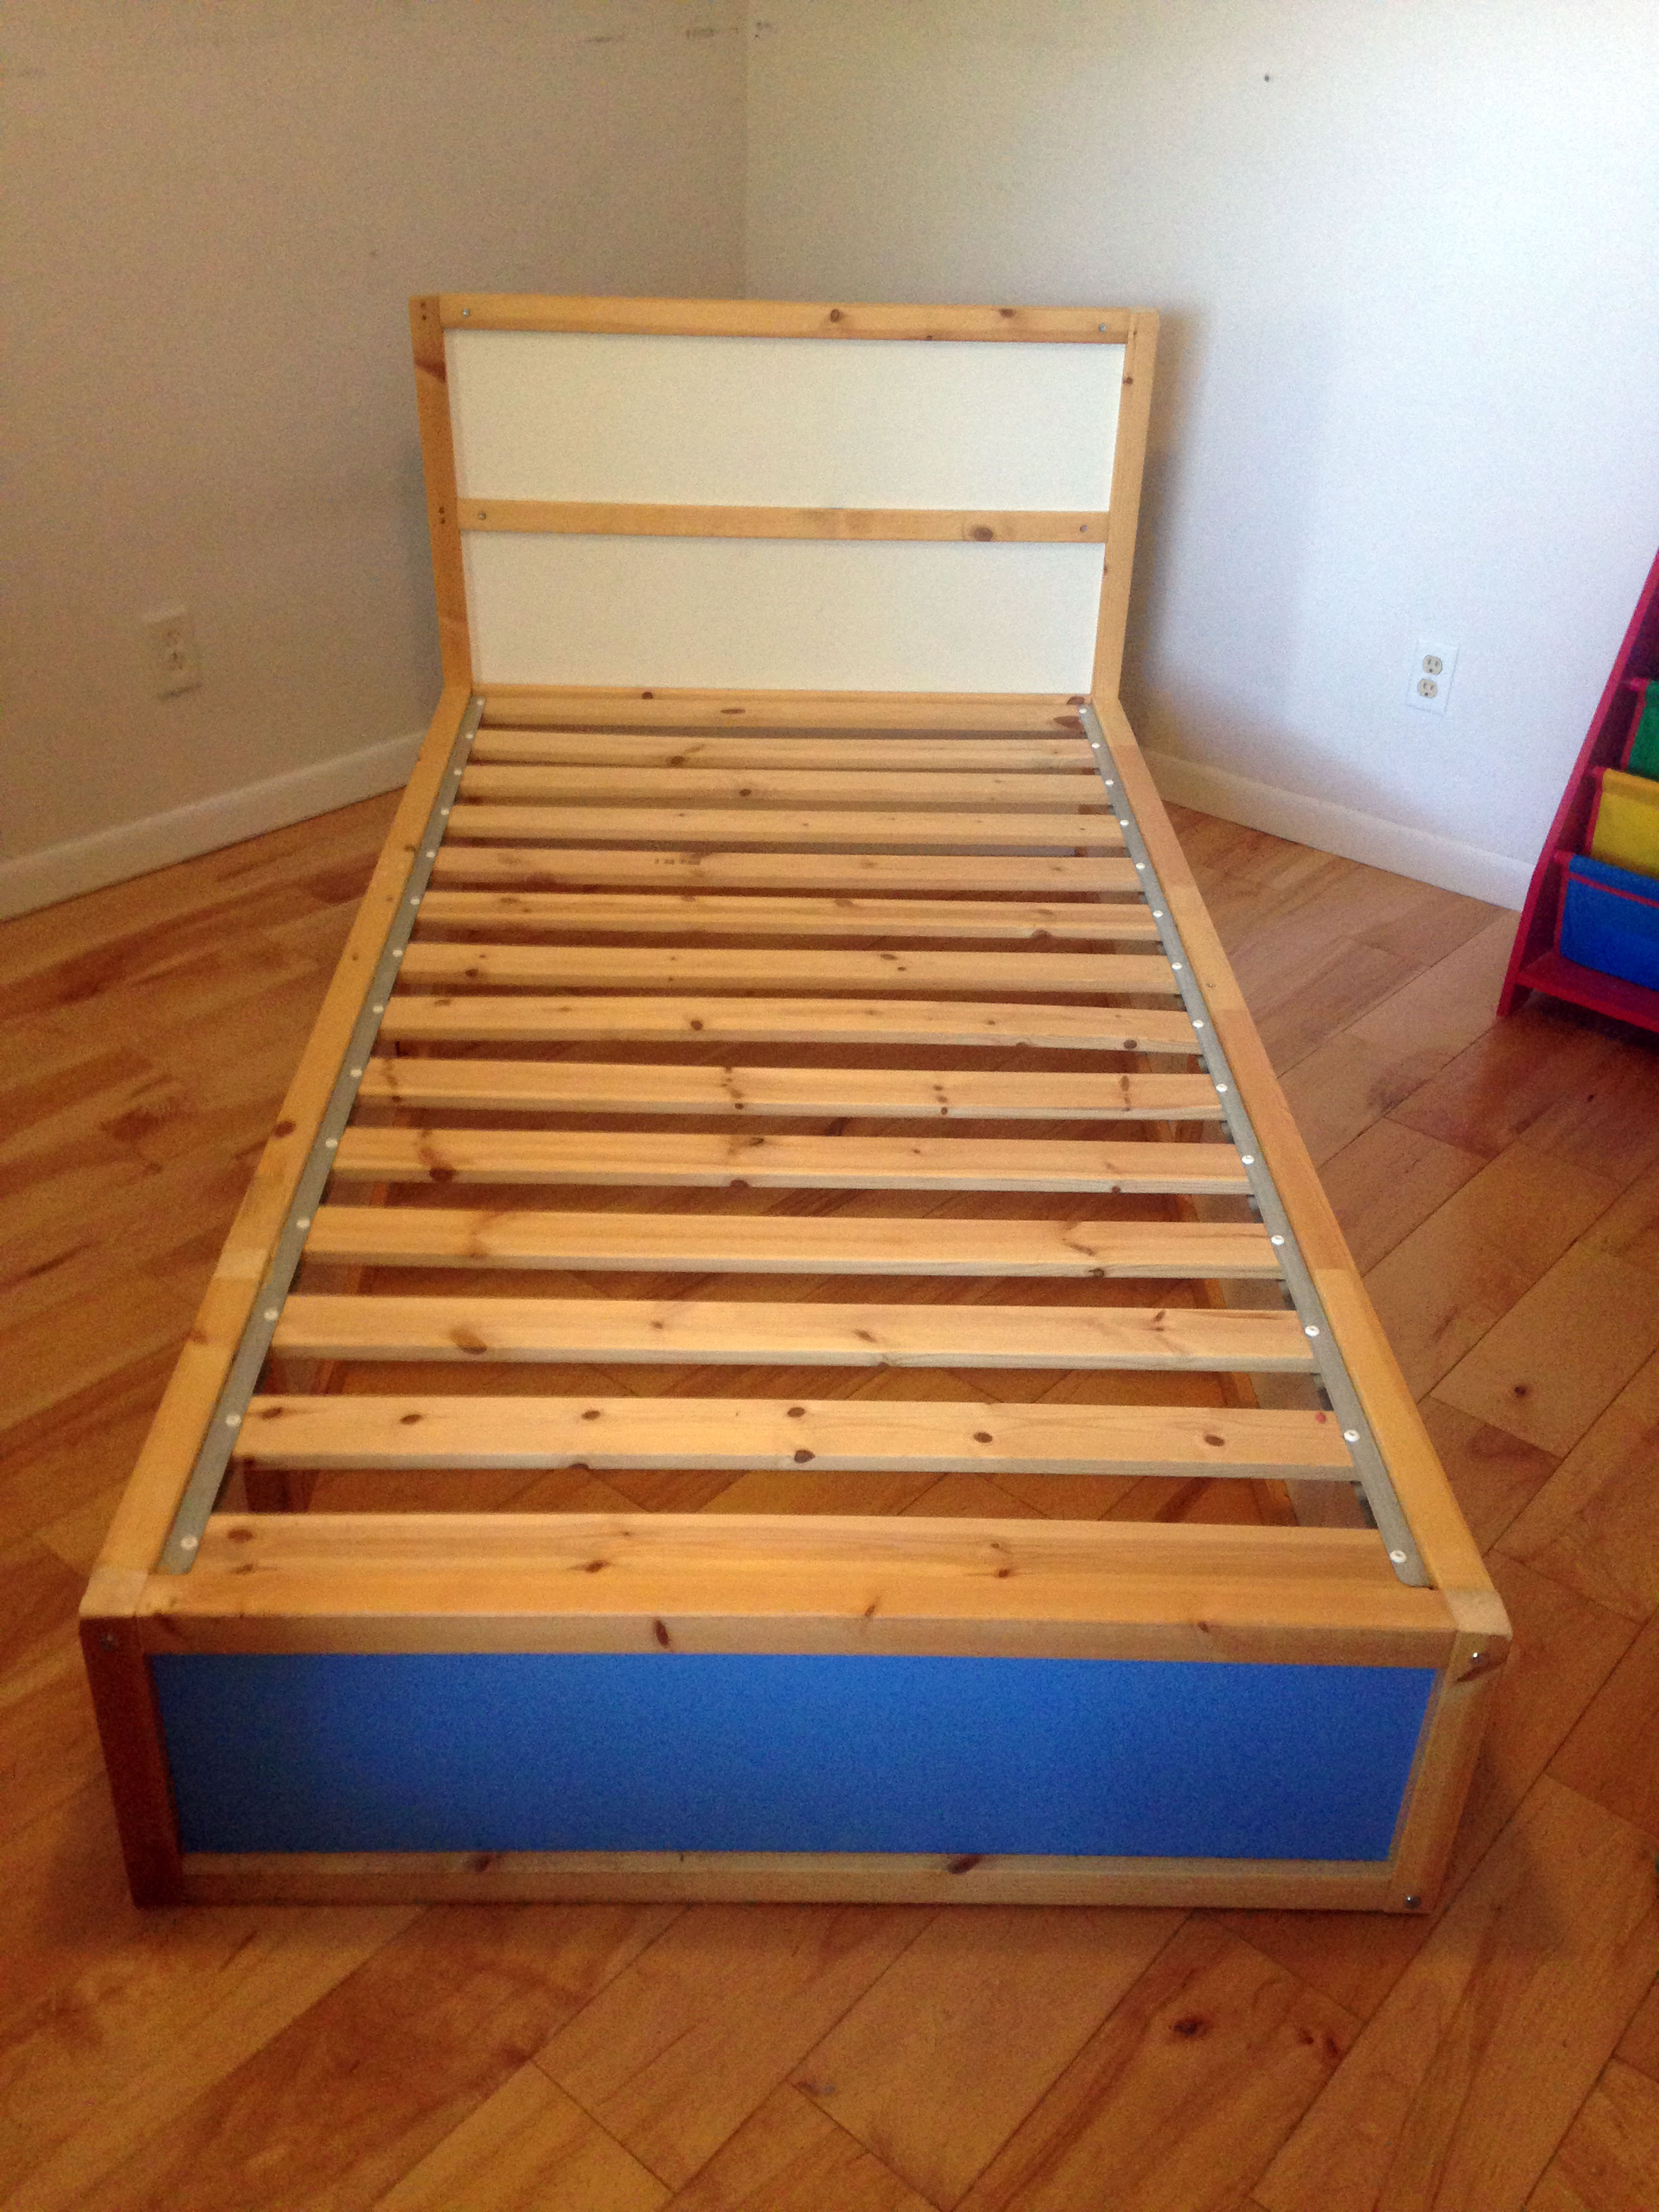 USB Bed: Save Money by Hacking an IKEA KURA Bed - Jennifer ...